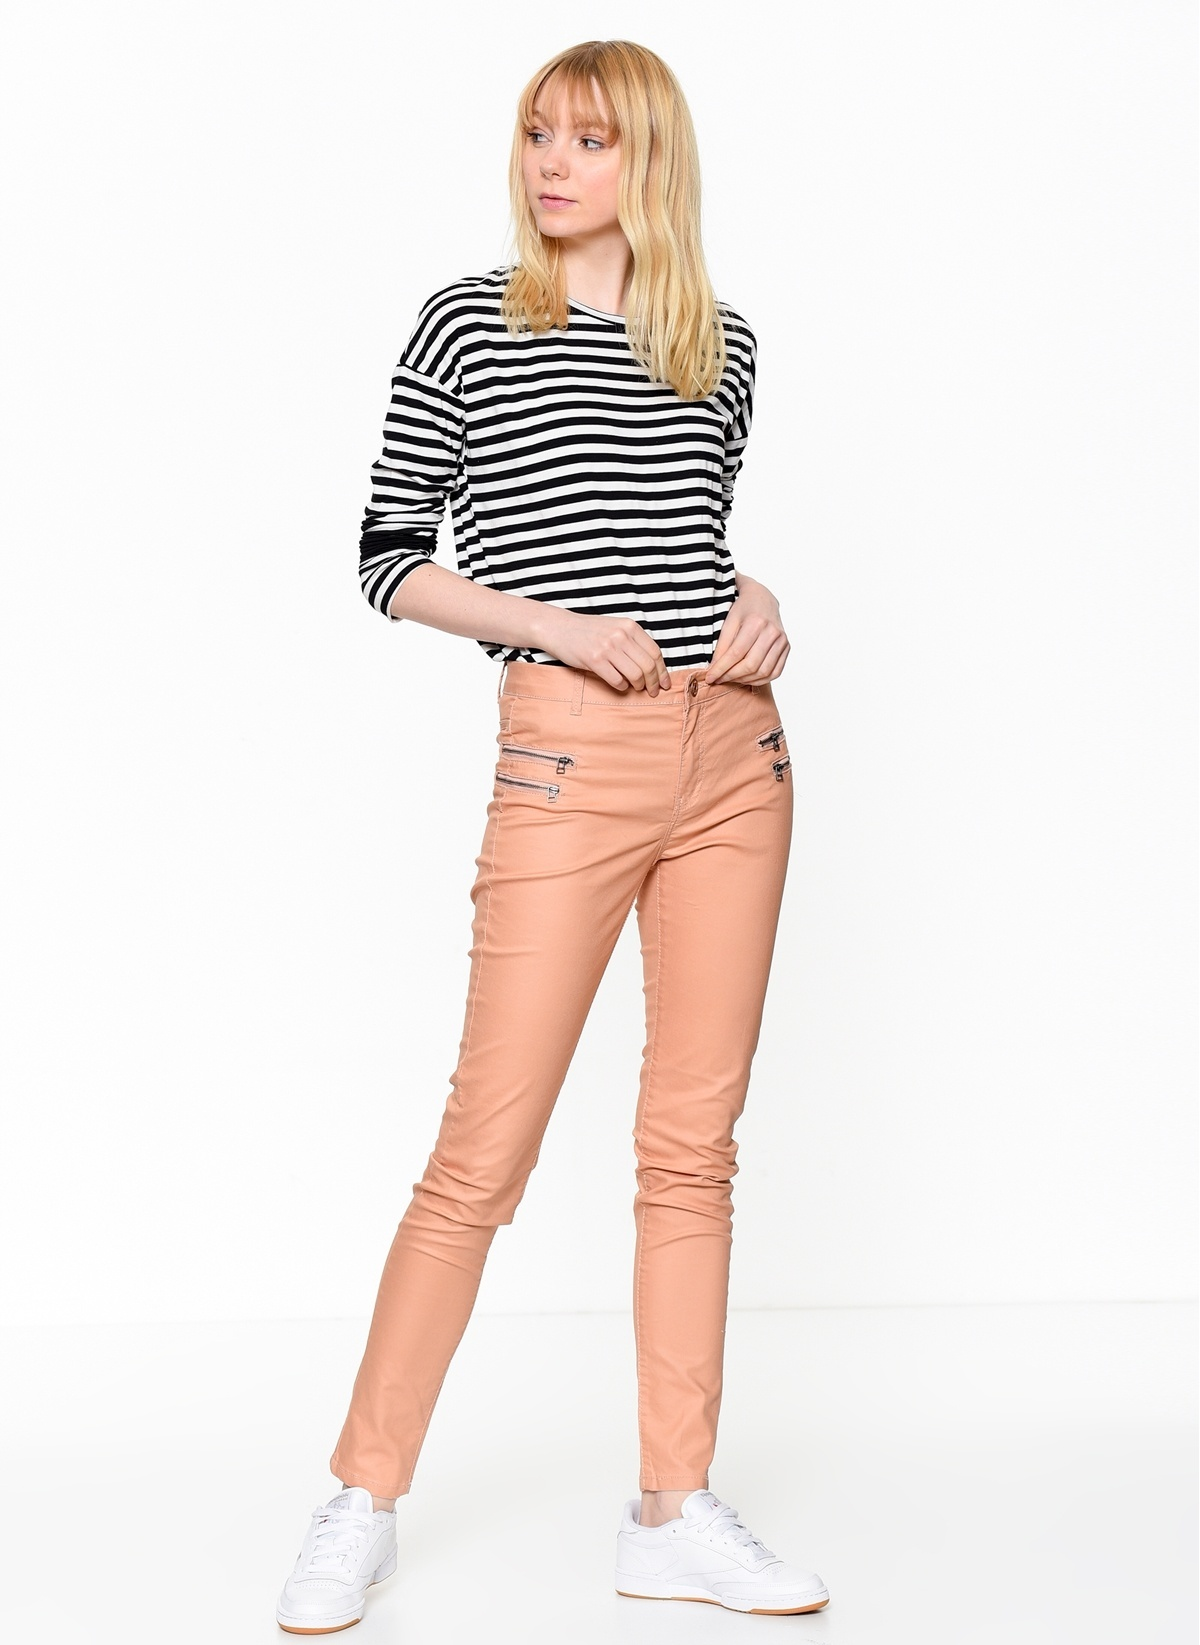 Vero Moda Pantolon | Fame 10121712 Fame Nw Sup.sl Zip Pants Pi333 – 29.9 TL